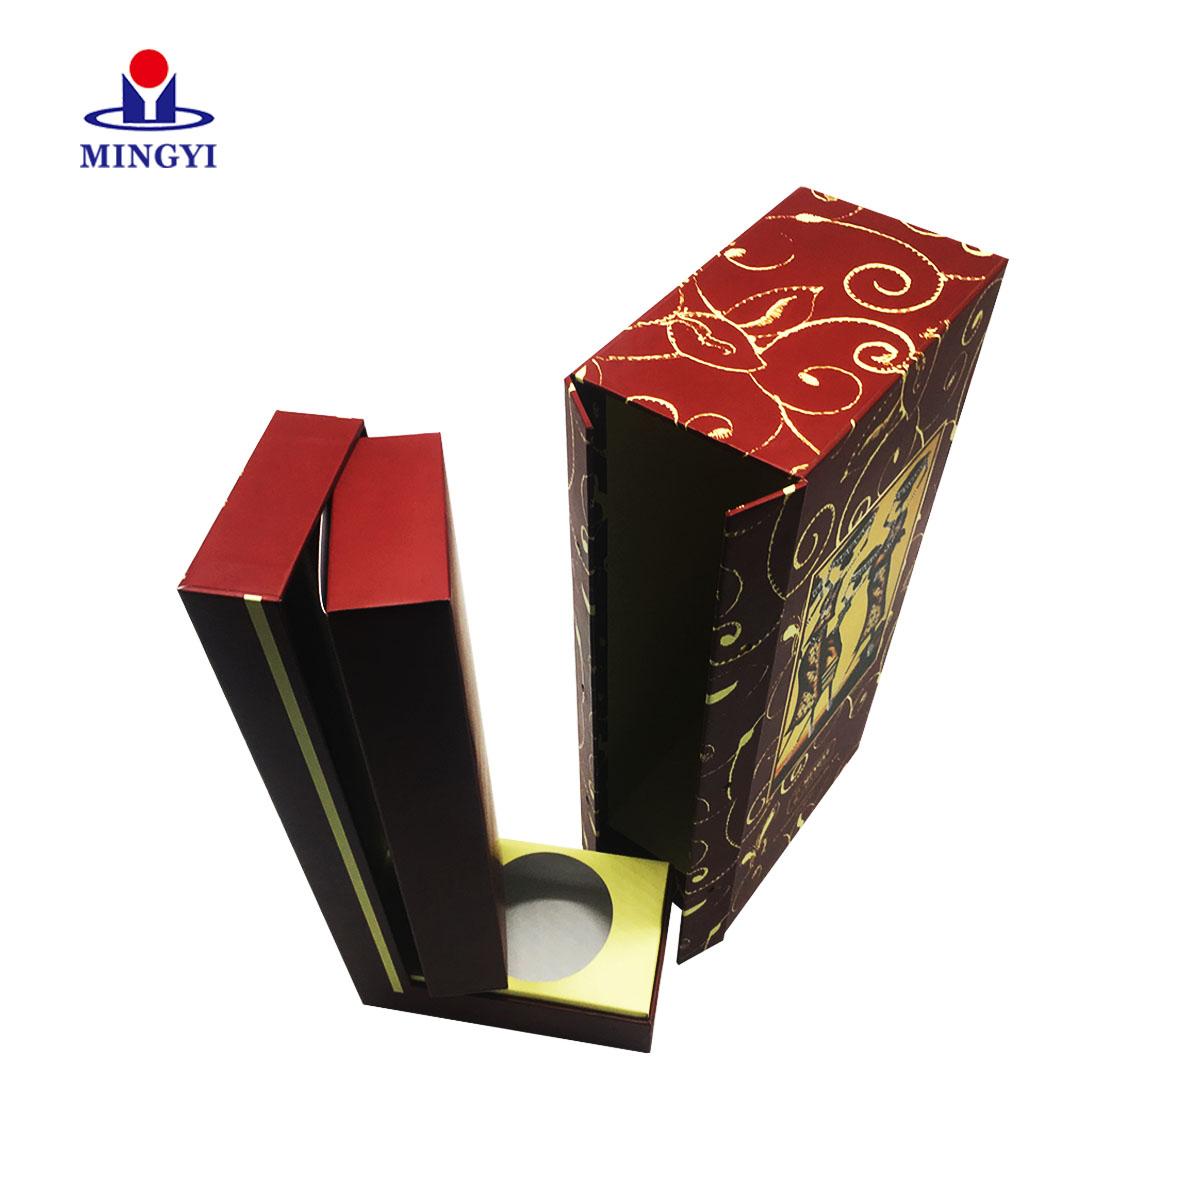 Mingyi Printing New custom gift boxes manufacturers for phone-Mingyi Printing